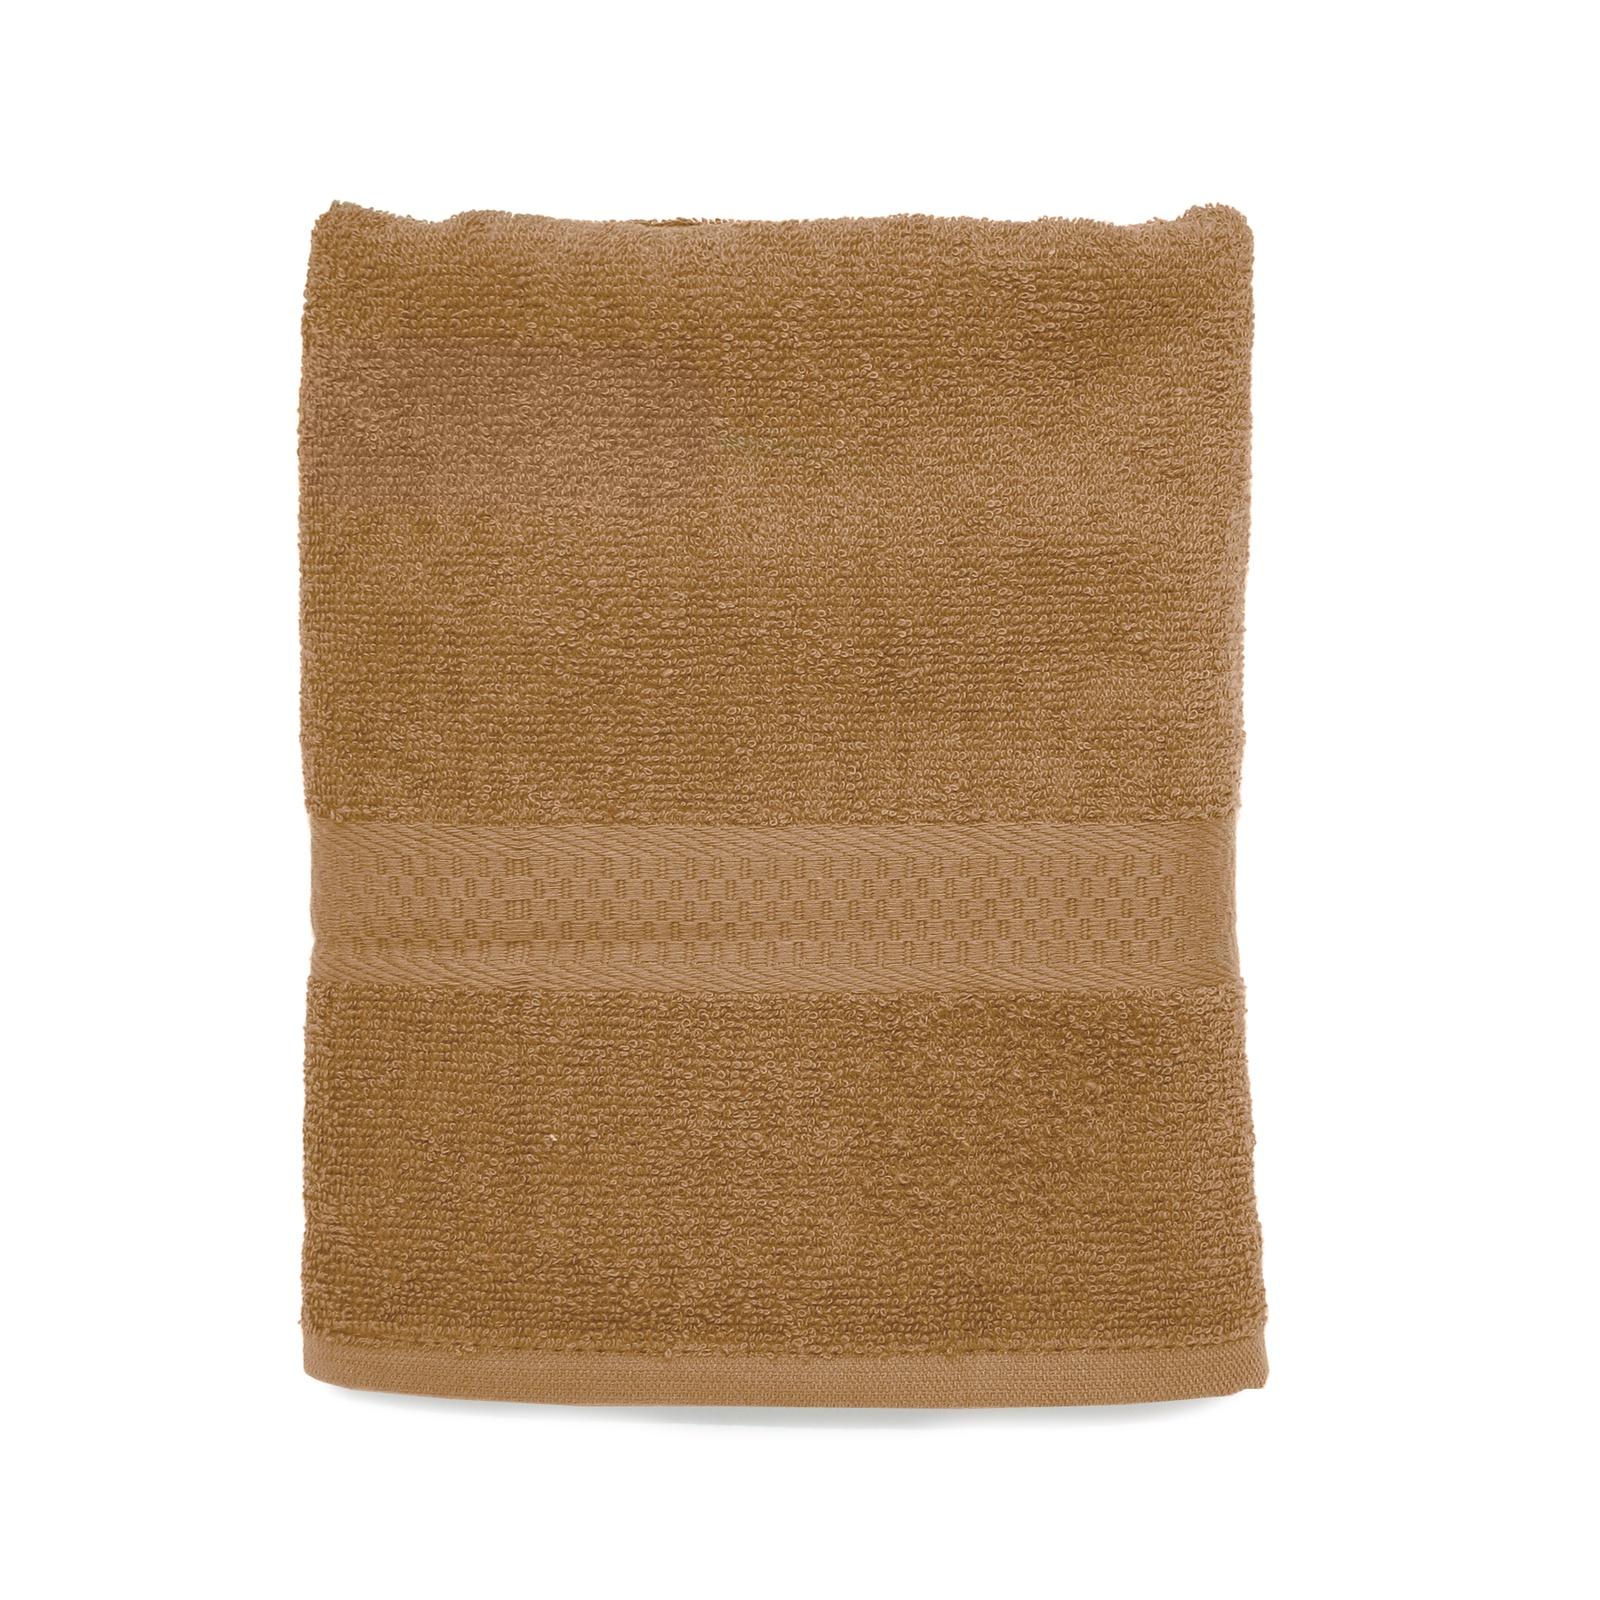 Полотенце банное Spany, 21311318185, махровое, светло-коричневый, 50 х 90 см полотенце банное fiesta arabesca 50 90 см